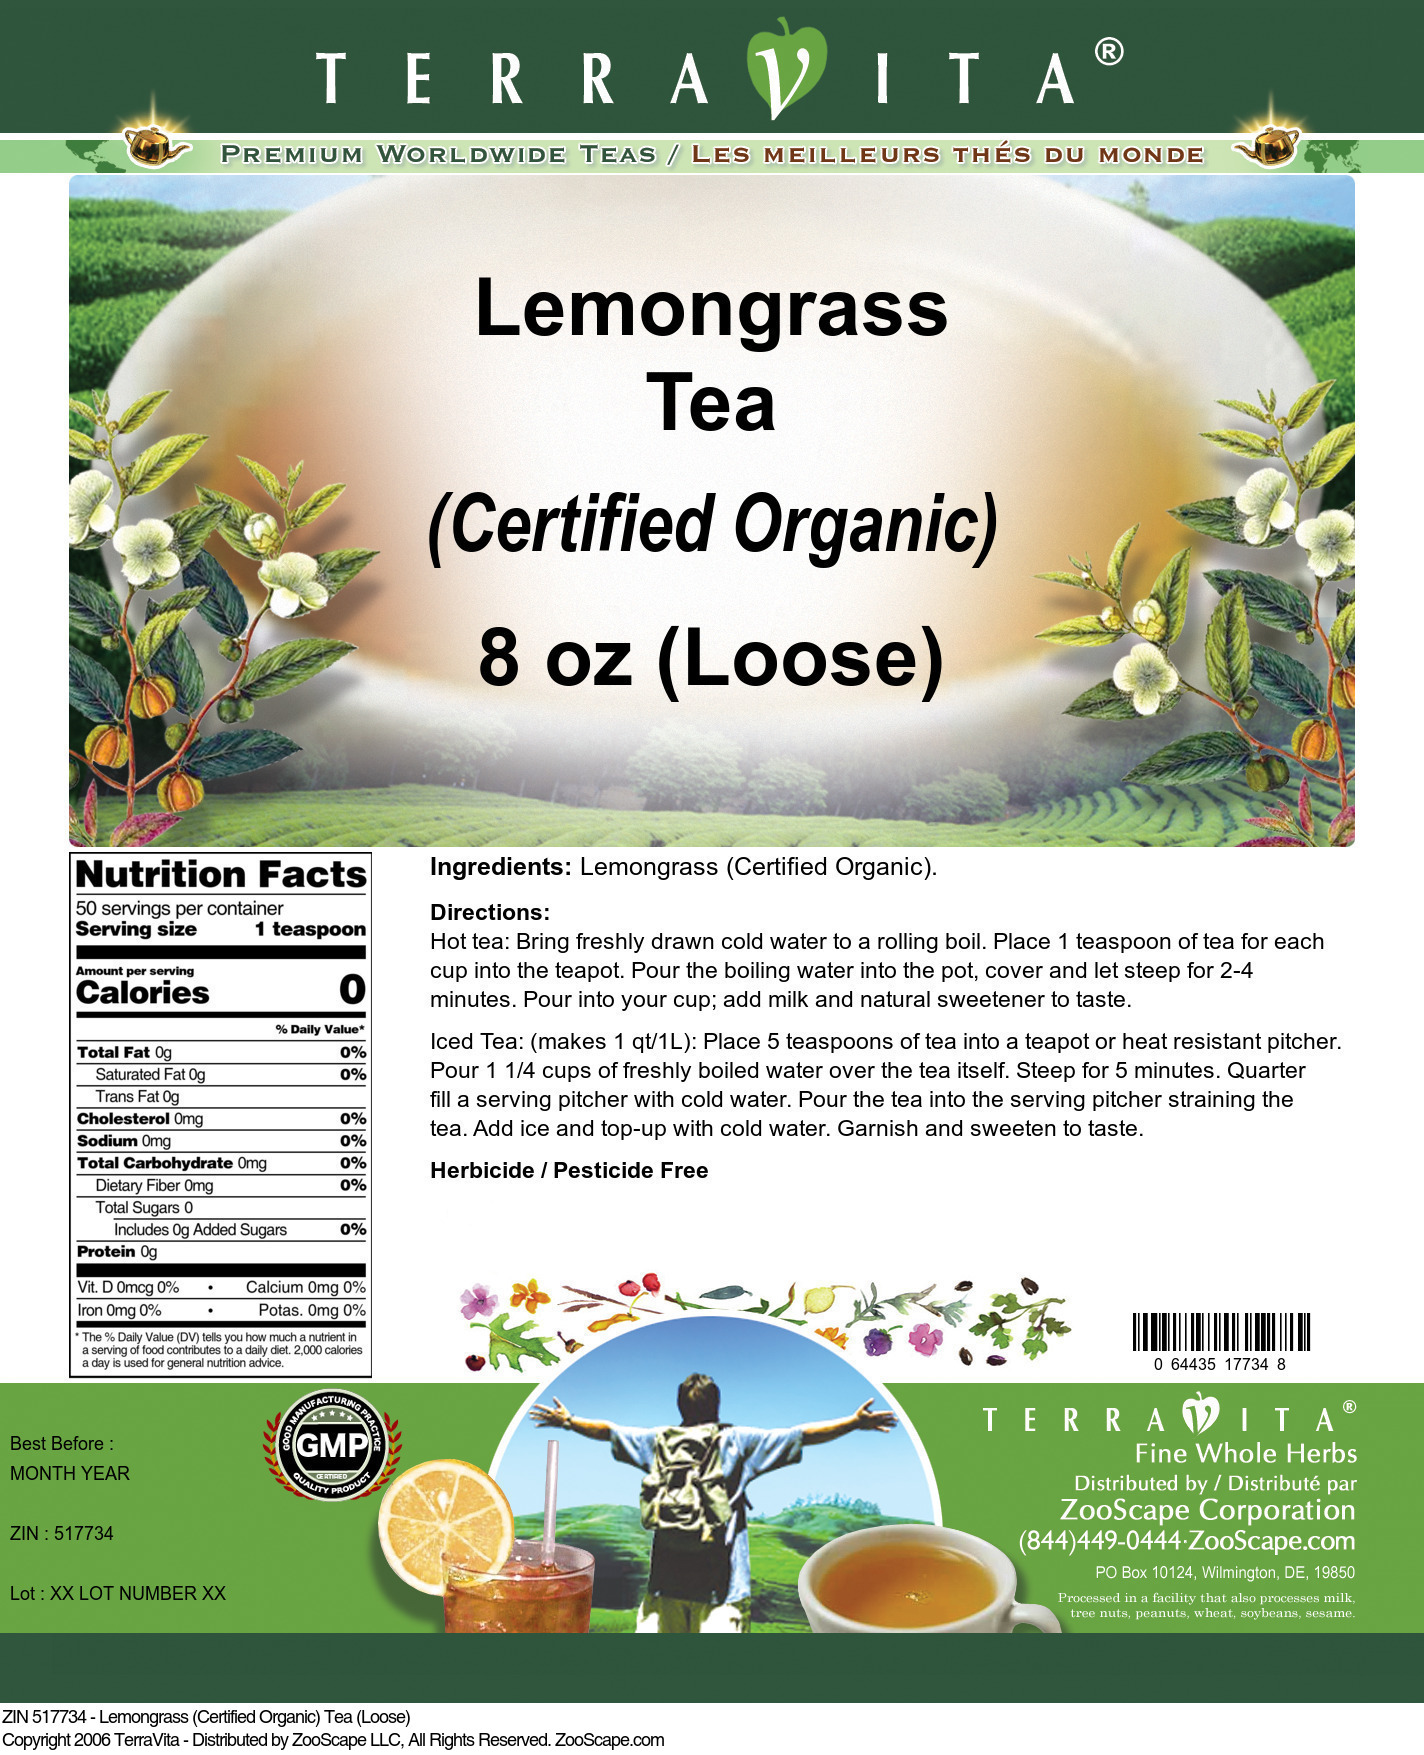 Lemongrass (Certified Organic) Tea (Loose)